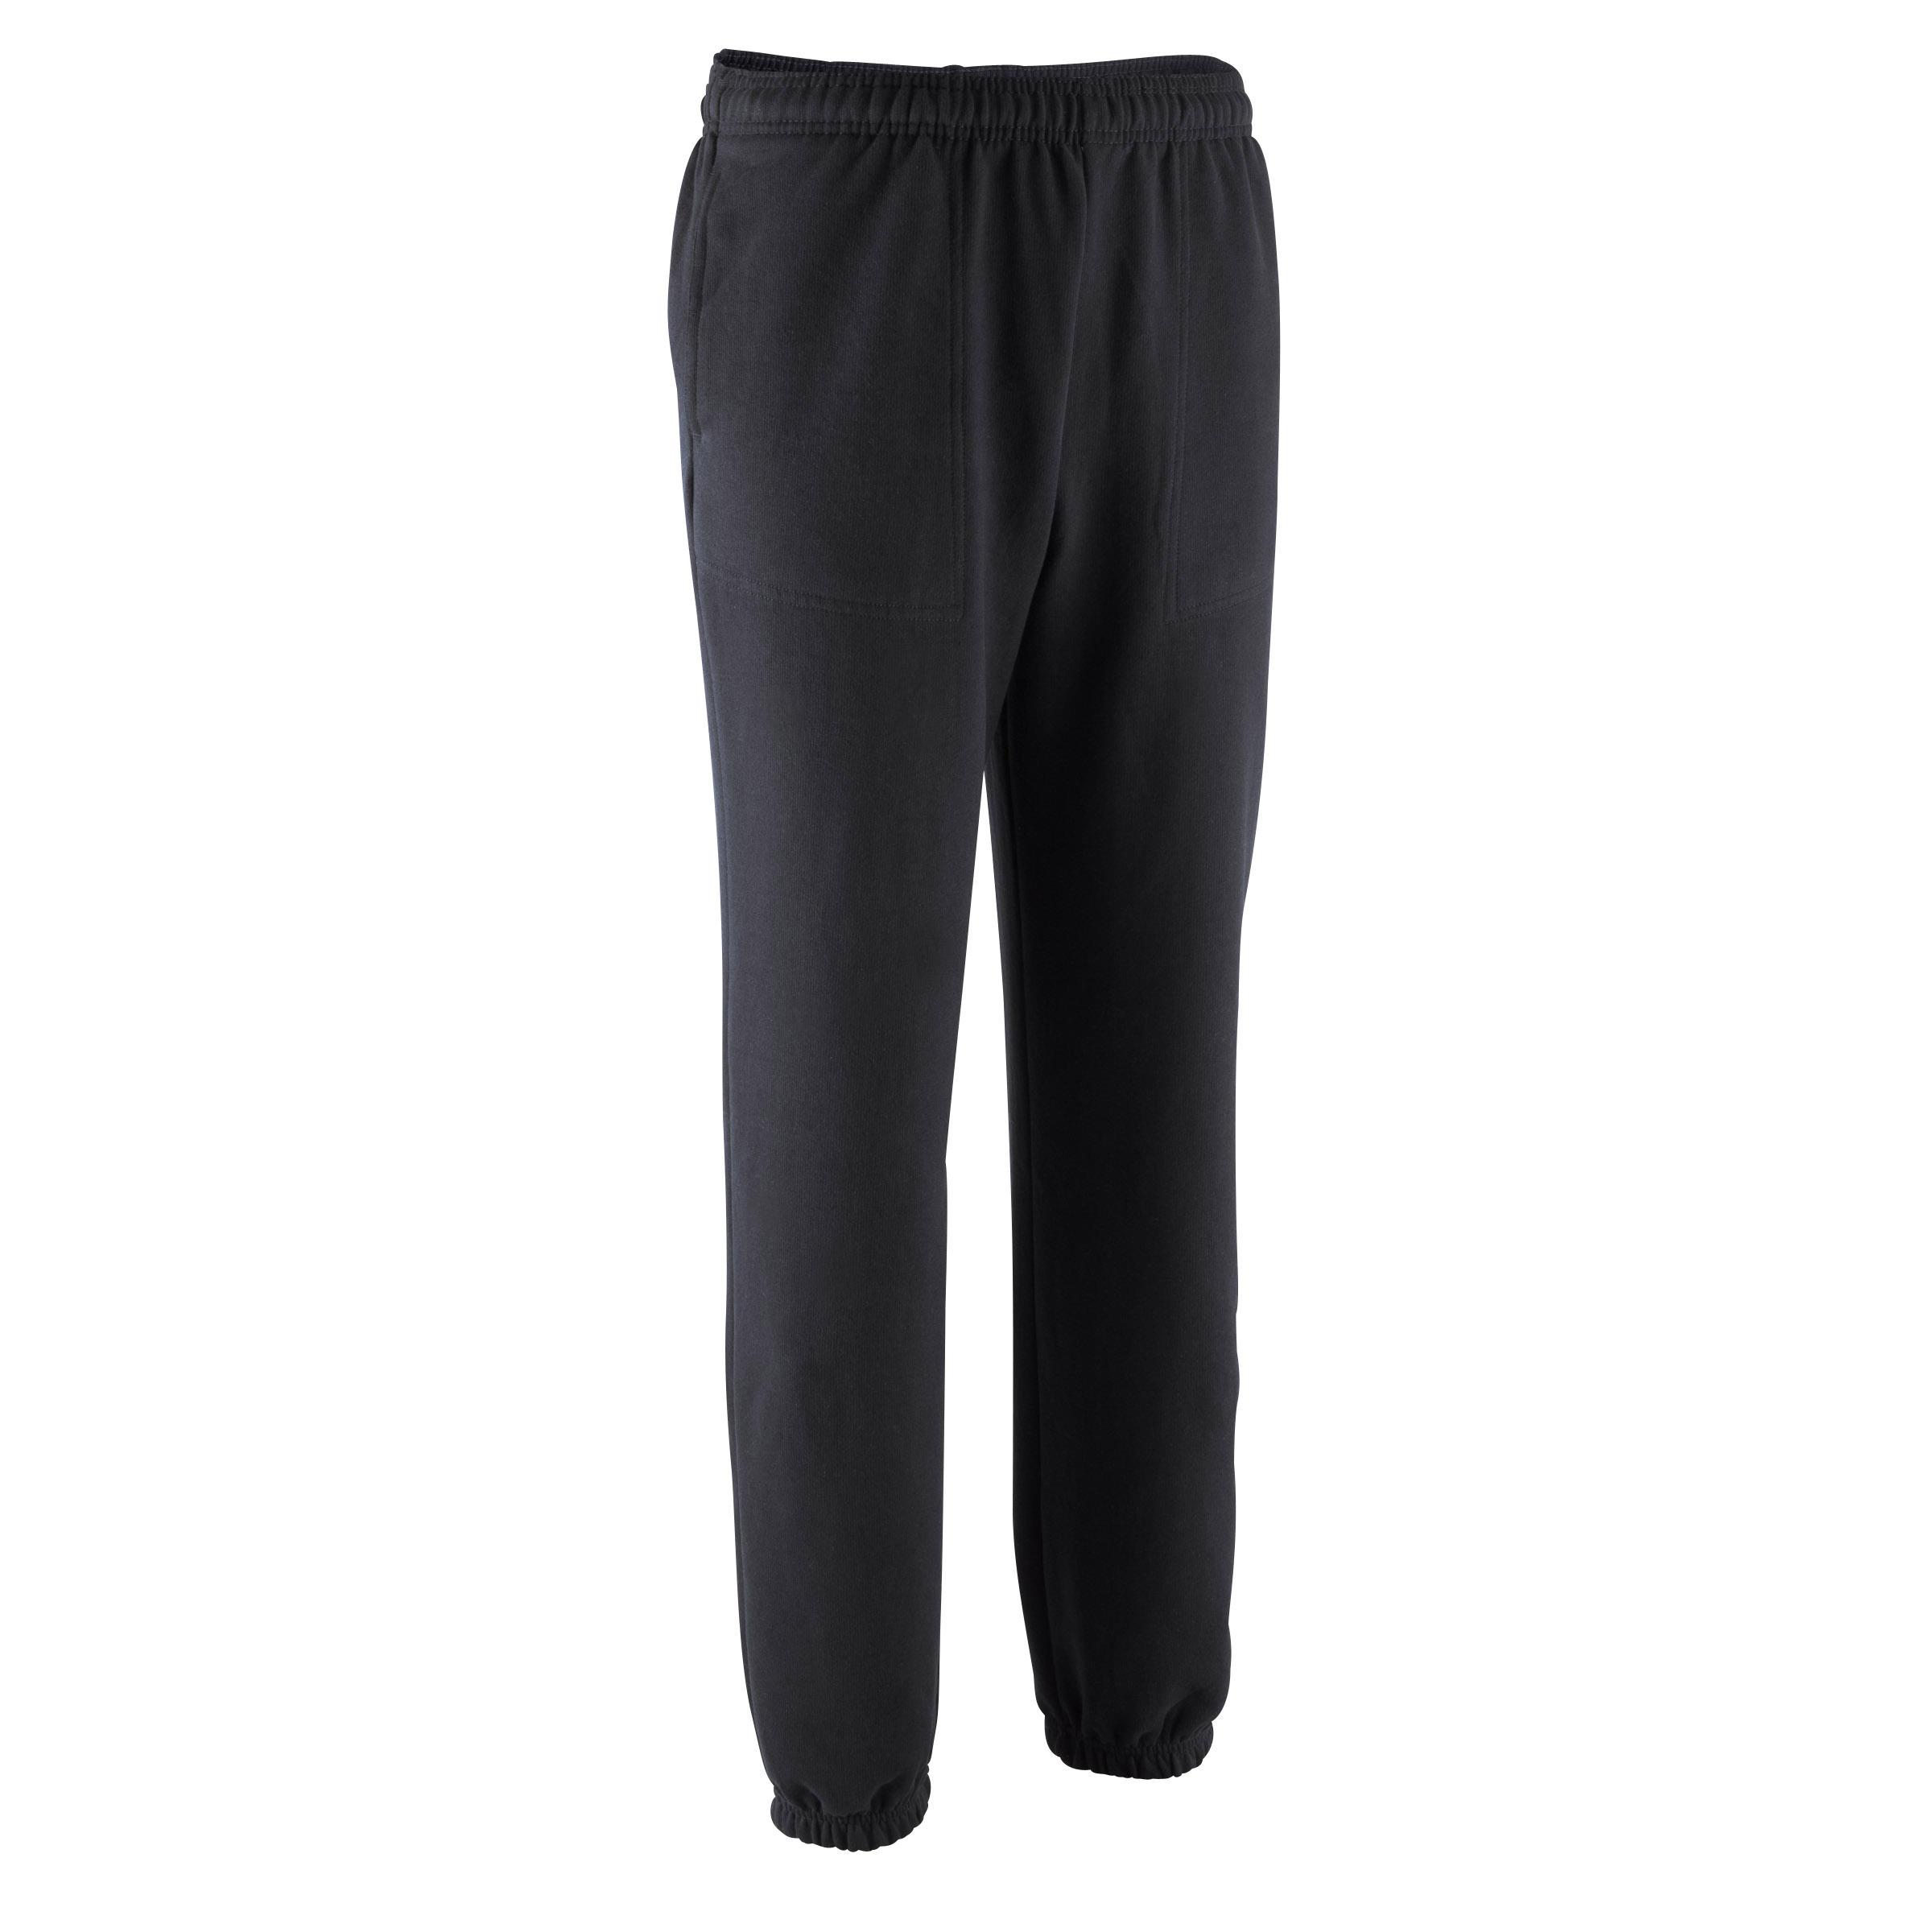 Pantalon bas large...